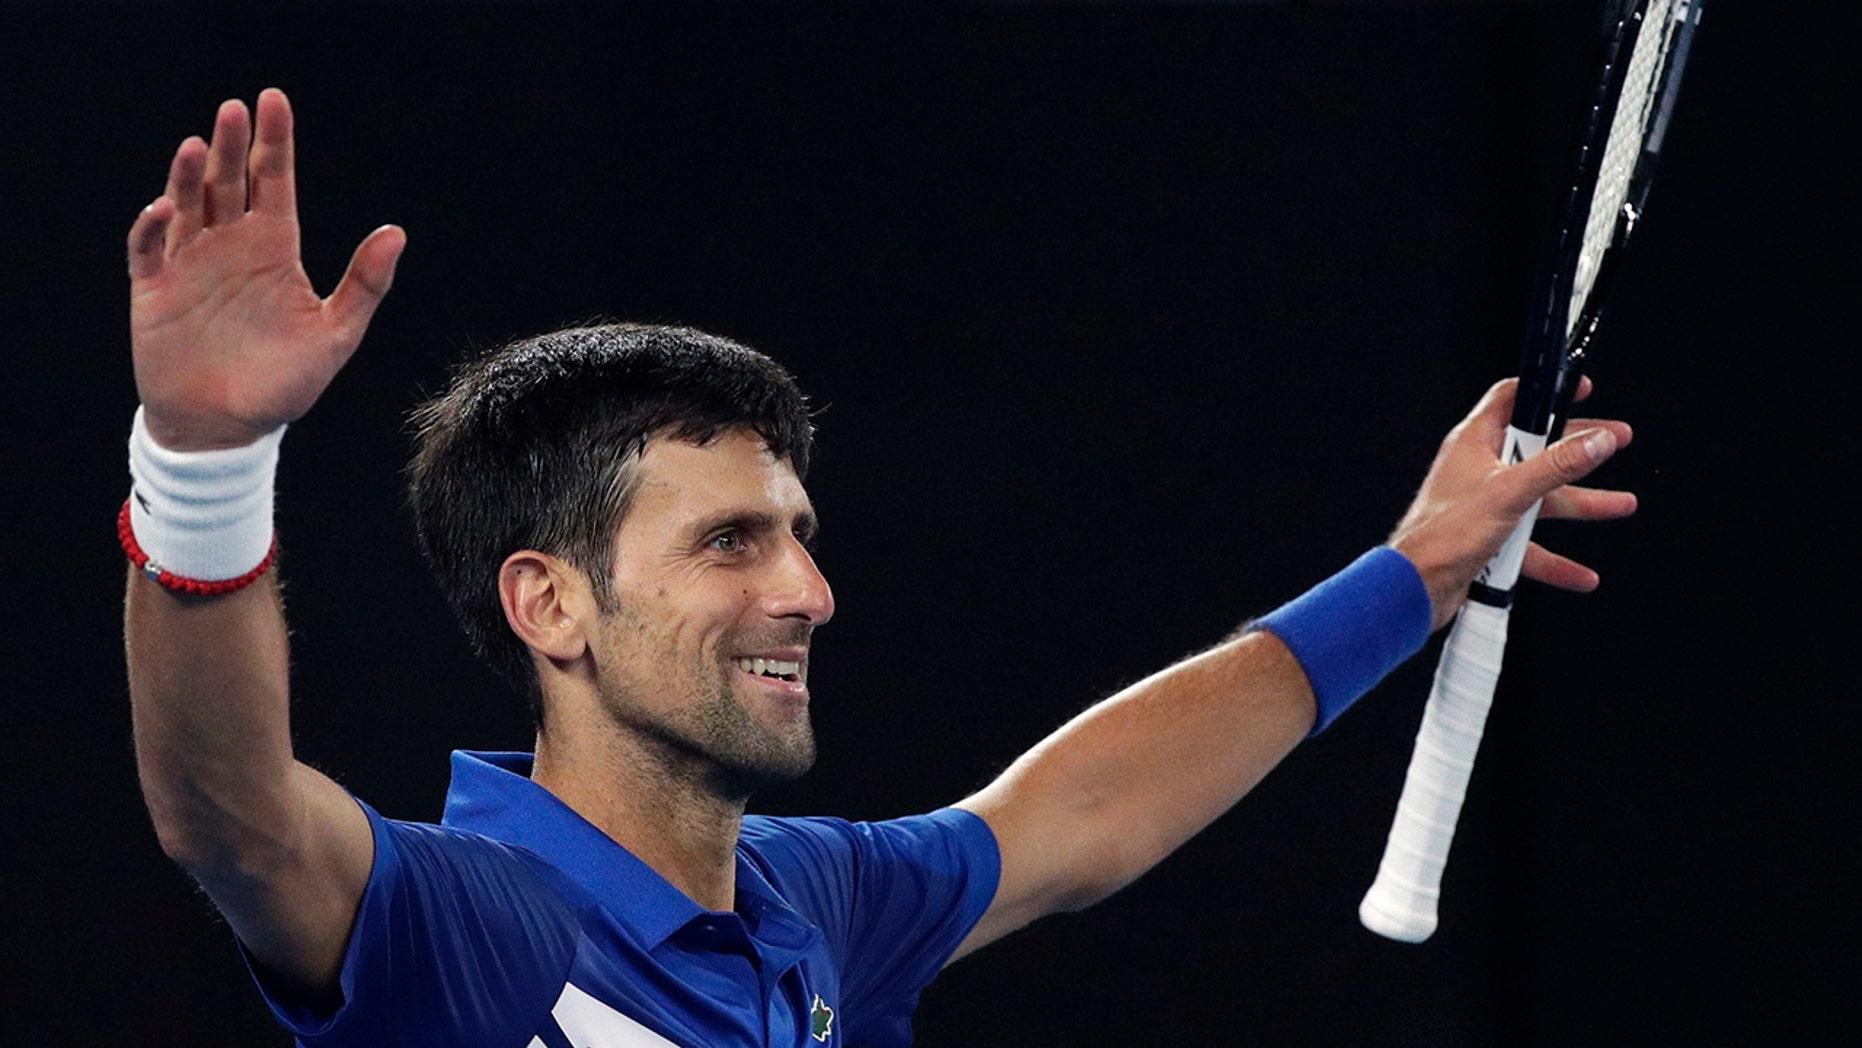 "Serbia's Novak Djokovic celebrates after defeating Spaniard Rafael Nadal in the men's final at the Australian Open Tennis Championships in Melbourne, Australia on Sunday, January 27, 201<div class=""e3lan e3lan-in-post1""><script async src=""//pagead2.googlesyndication.com/pagead/js/adsbygoogle.js""></script> <!-- Text_Display_Ad --> <ins class=""adsbygoogle""      style=""display:block""      data-ad-client=""ca-pub-7542518979287585""      data-ad-slot=""2196042218""      data-ad-format=""auto""></ins> <script> (adsbygoogle = window.adsbygoogle || []).push({}); </script></div>9. (Associated Press)"